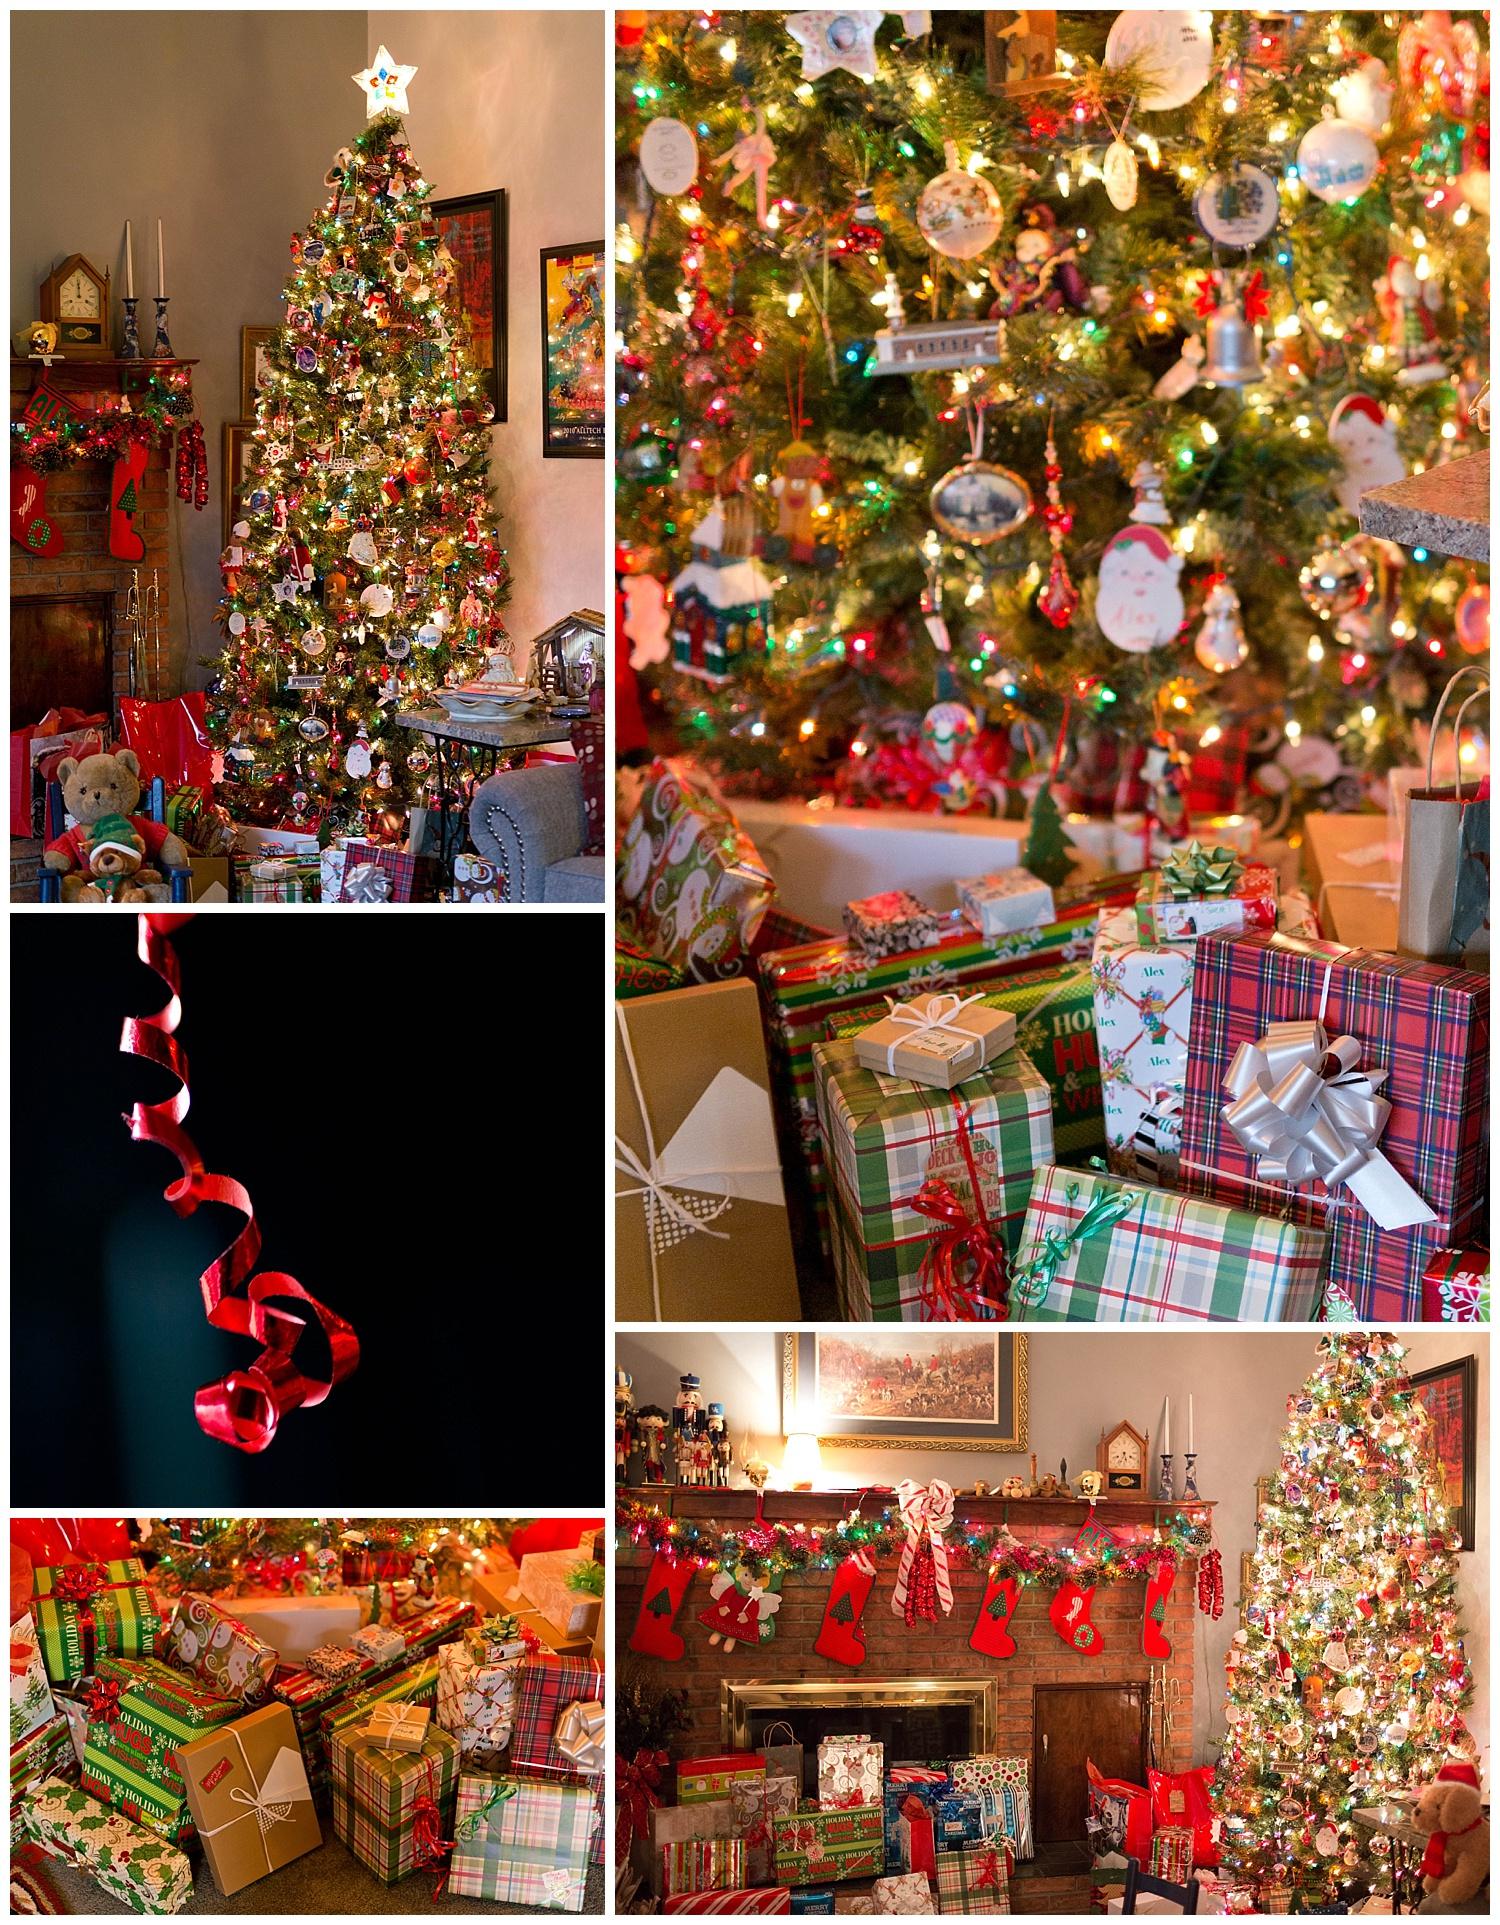 Christmas tree, gifts, ribbon, decorations